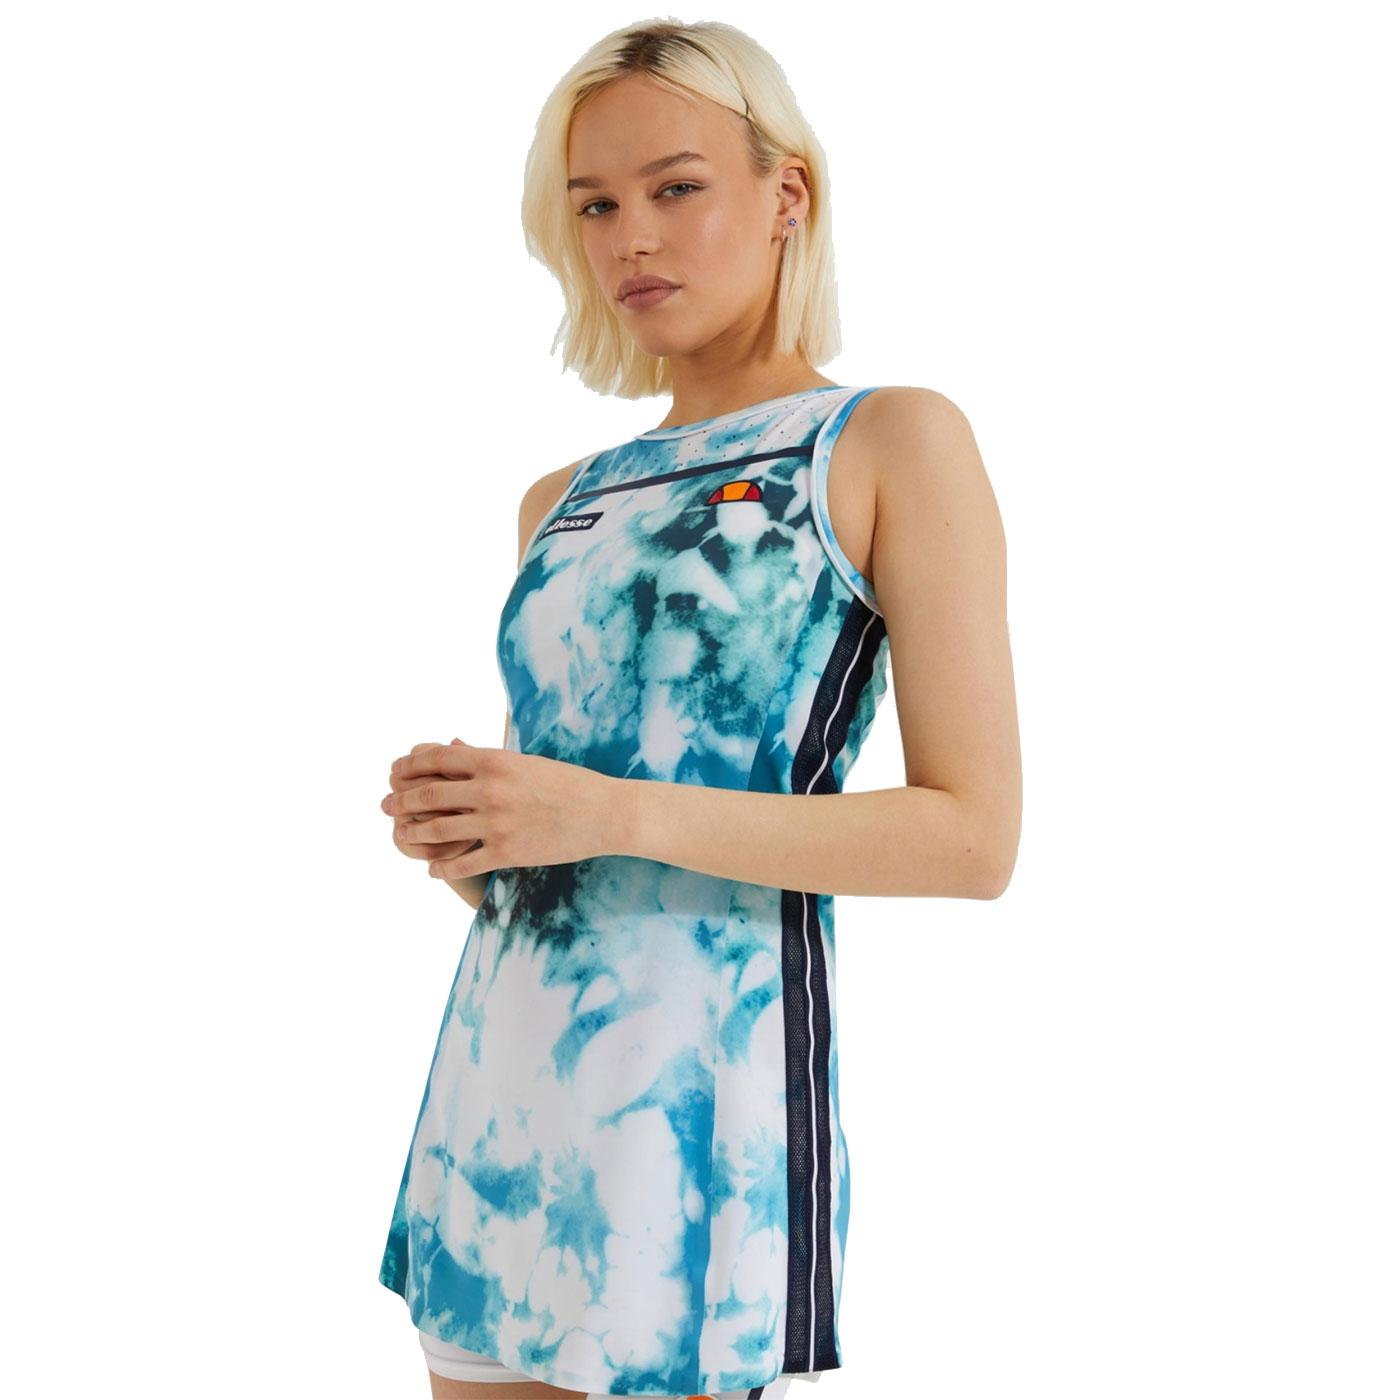 Marasusa ELLESSE Retro All Over Print Tennis Dress